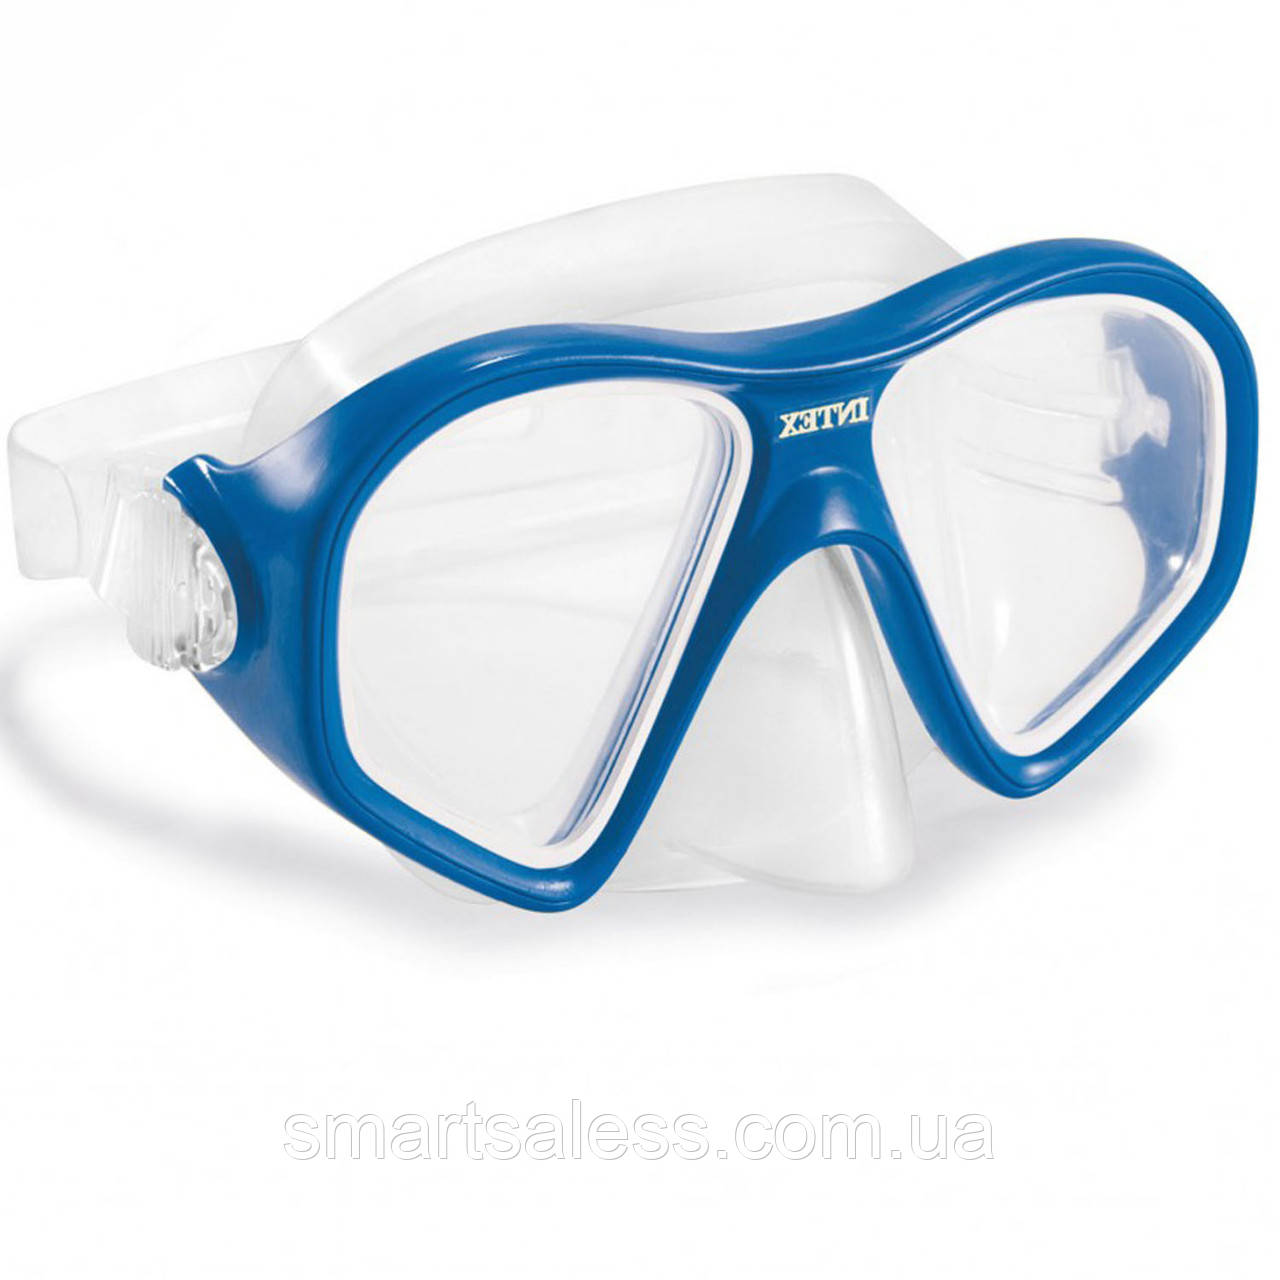 Маска для плавания Intex 55977, размер L (14+), обхват головы ≈ 54-65 см,синяя